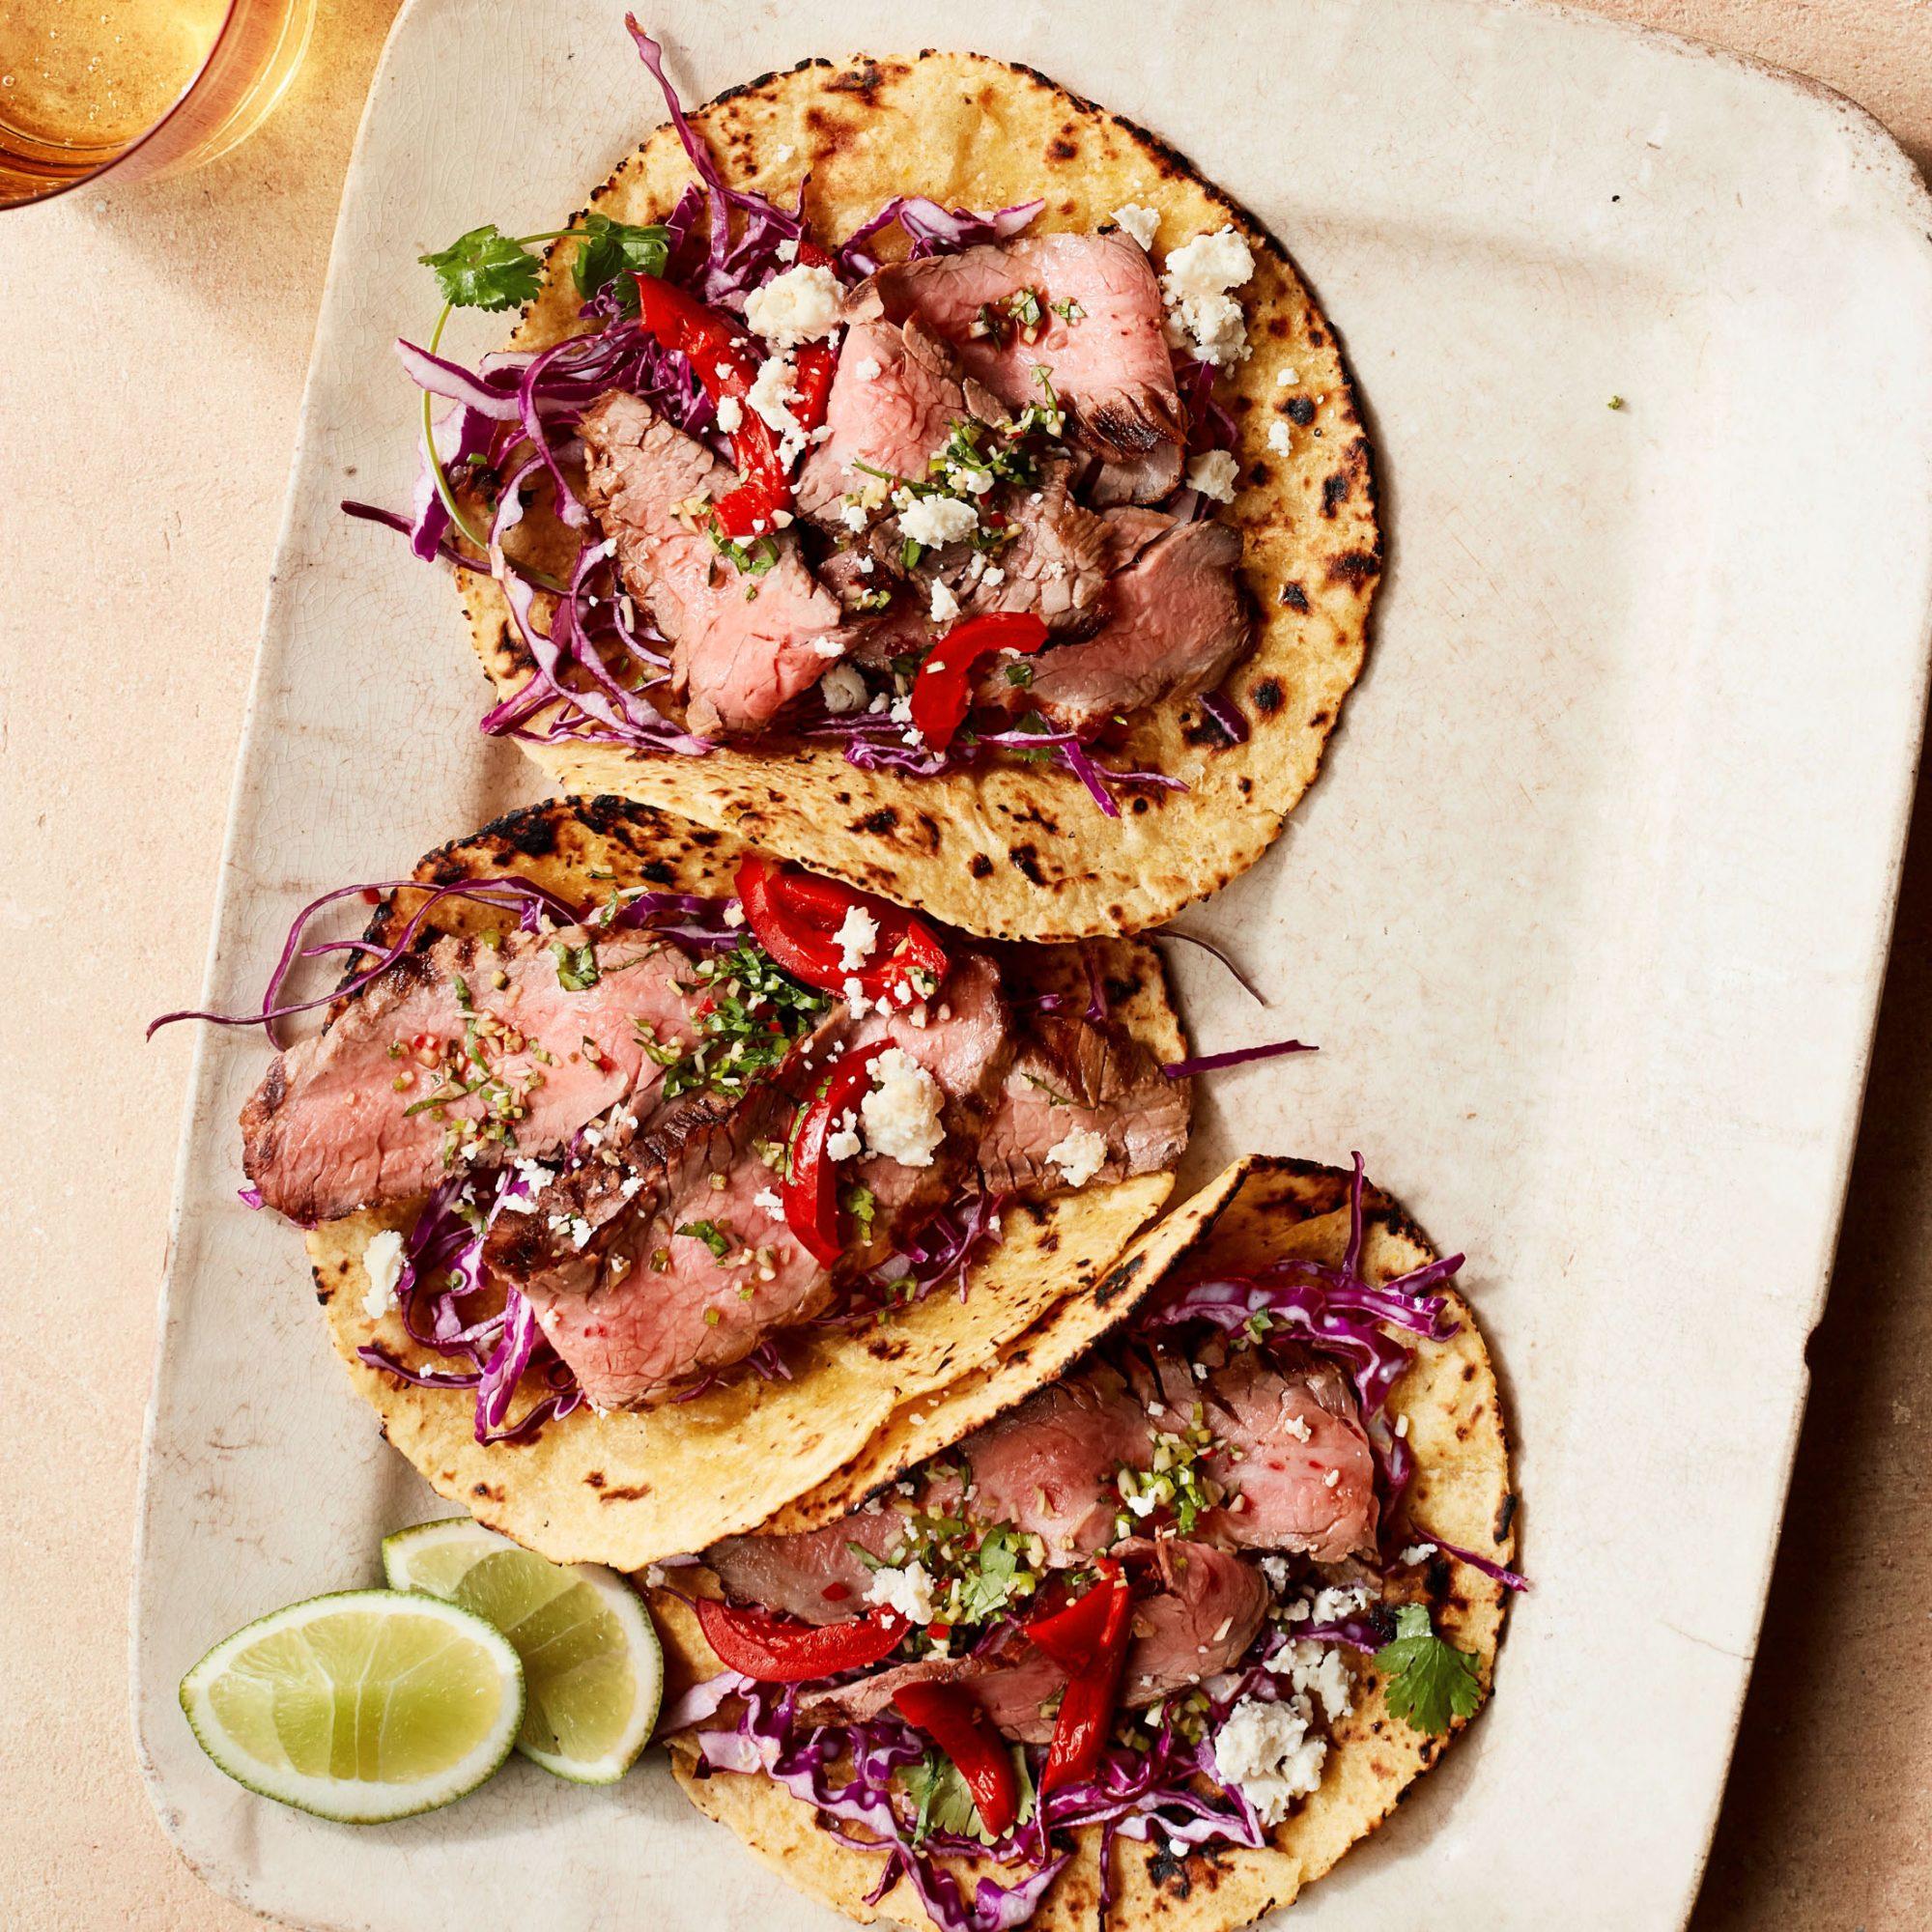 mezcal-marinated steak tacos